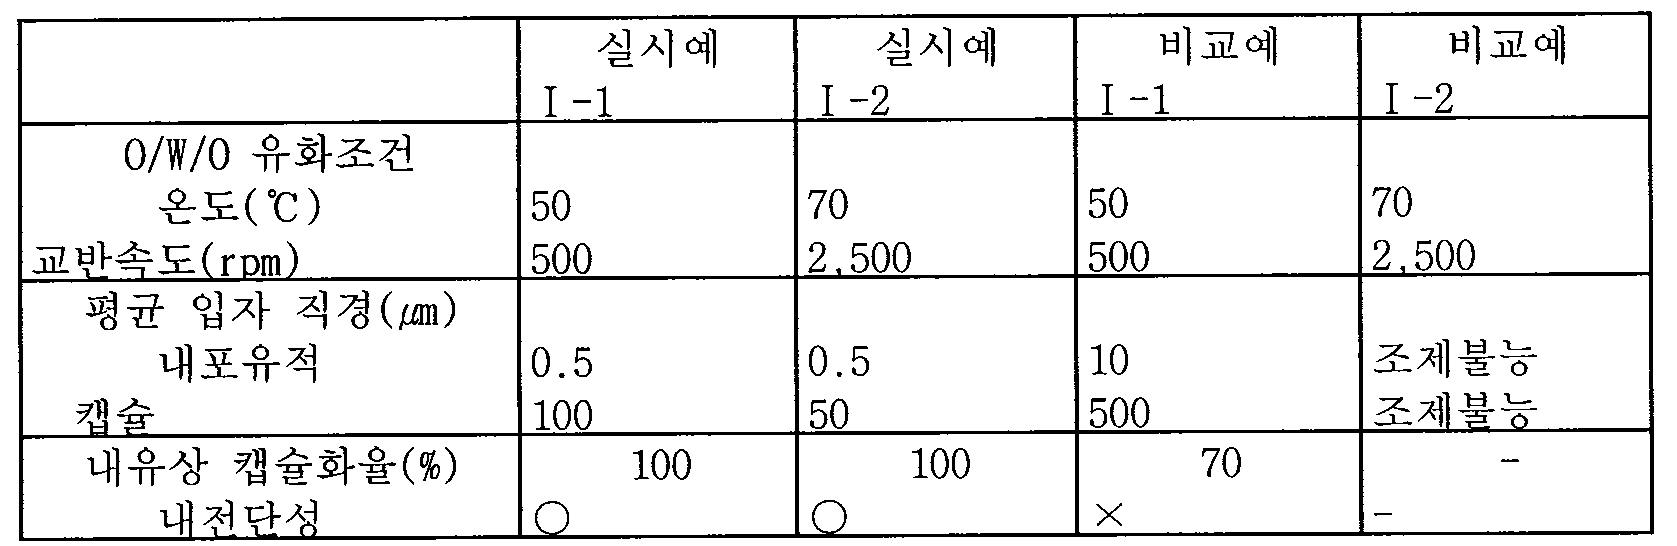 Figure 112005503159226-pat00003